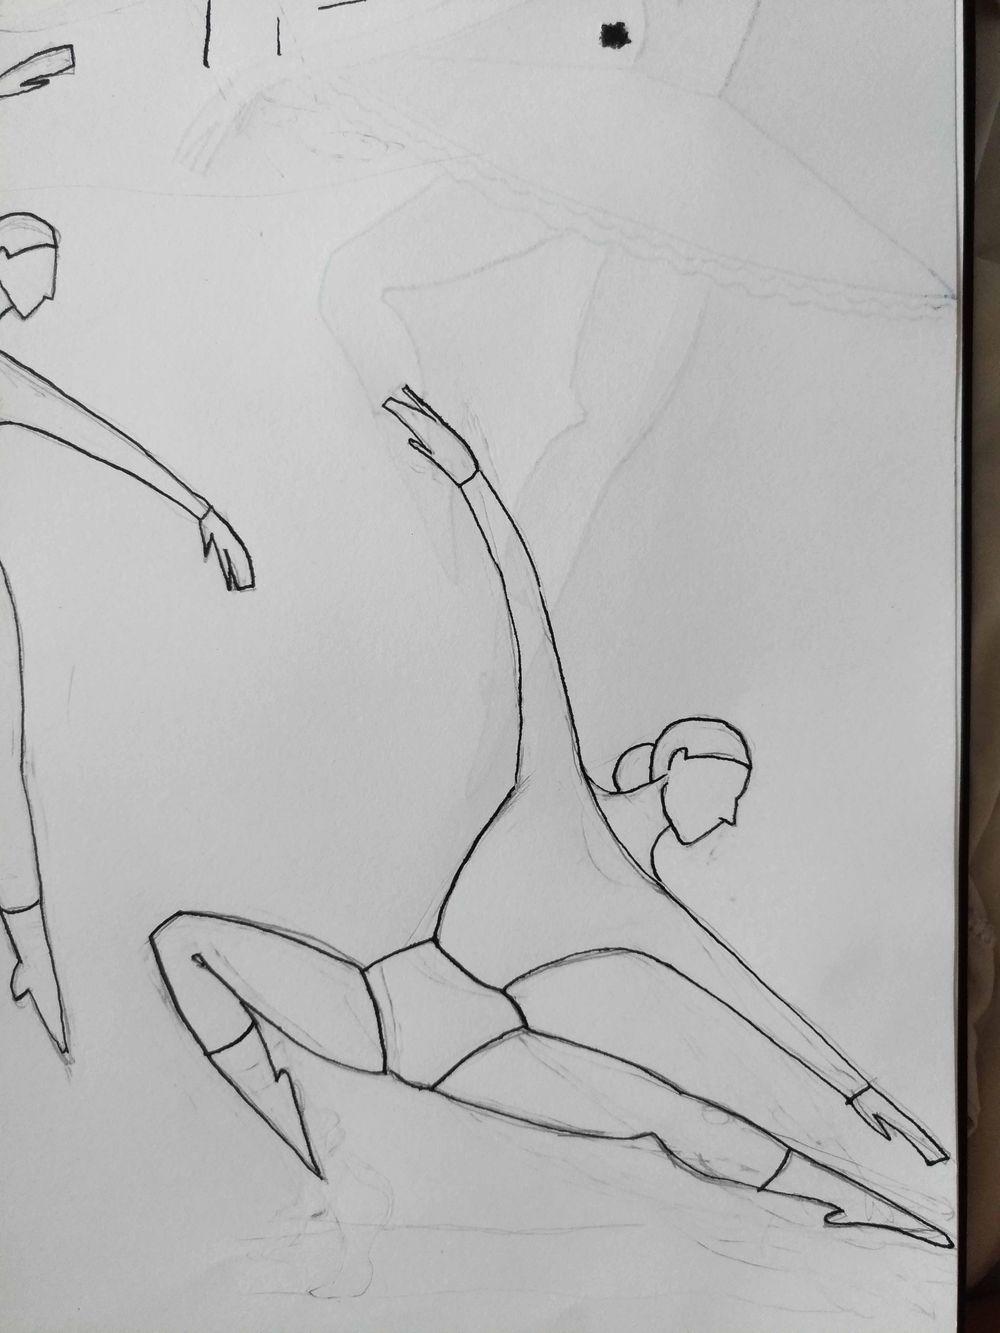 ballet dancers - image 1 - student project